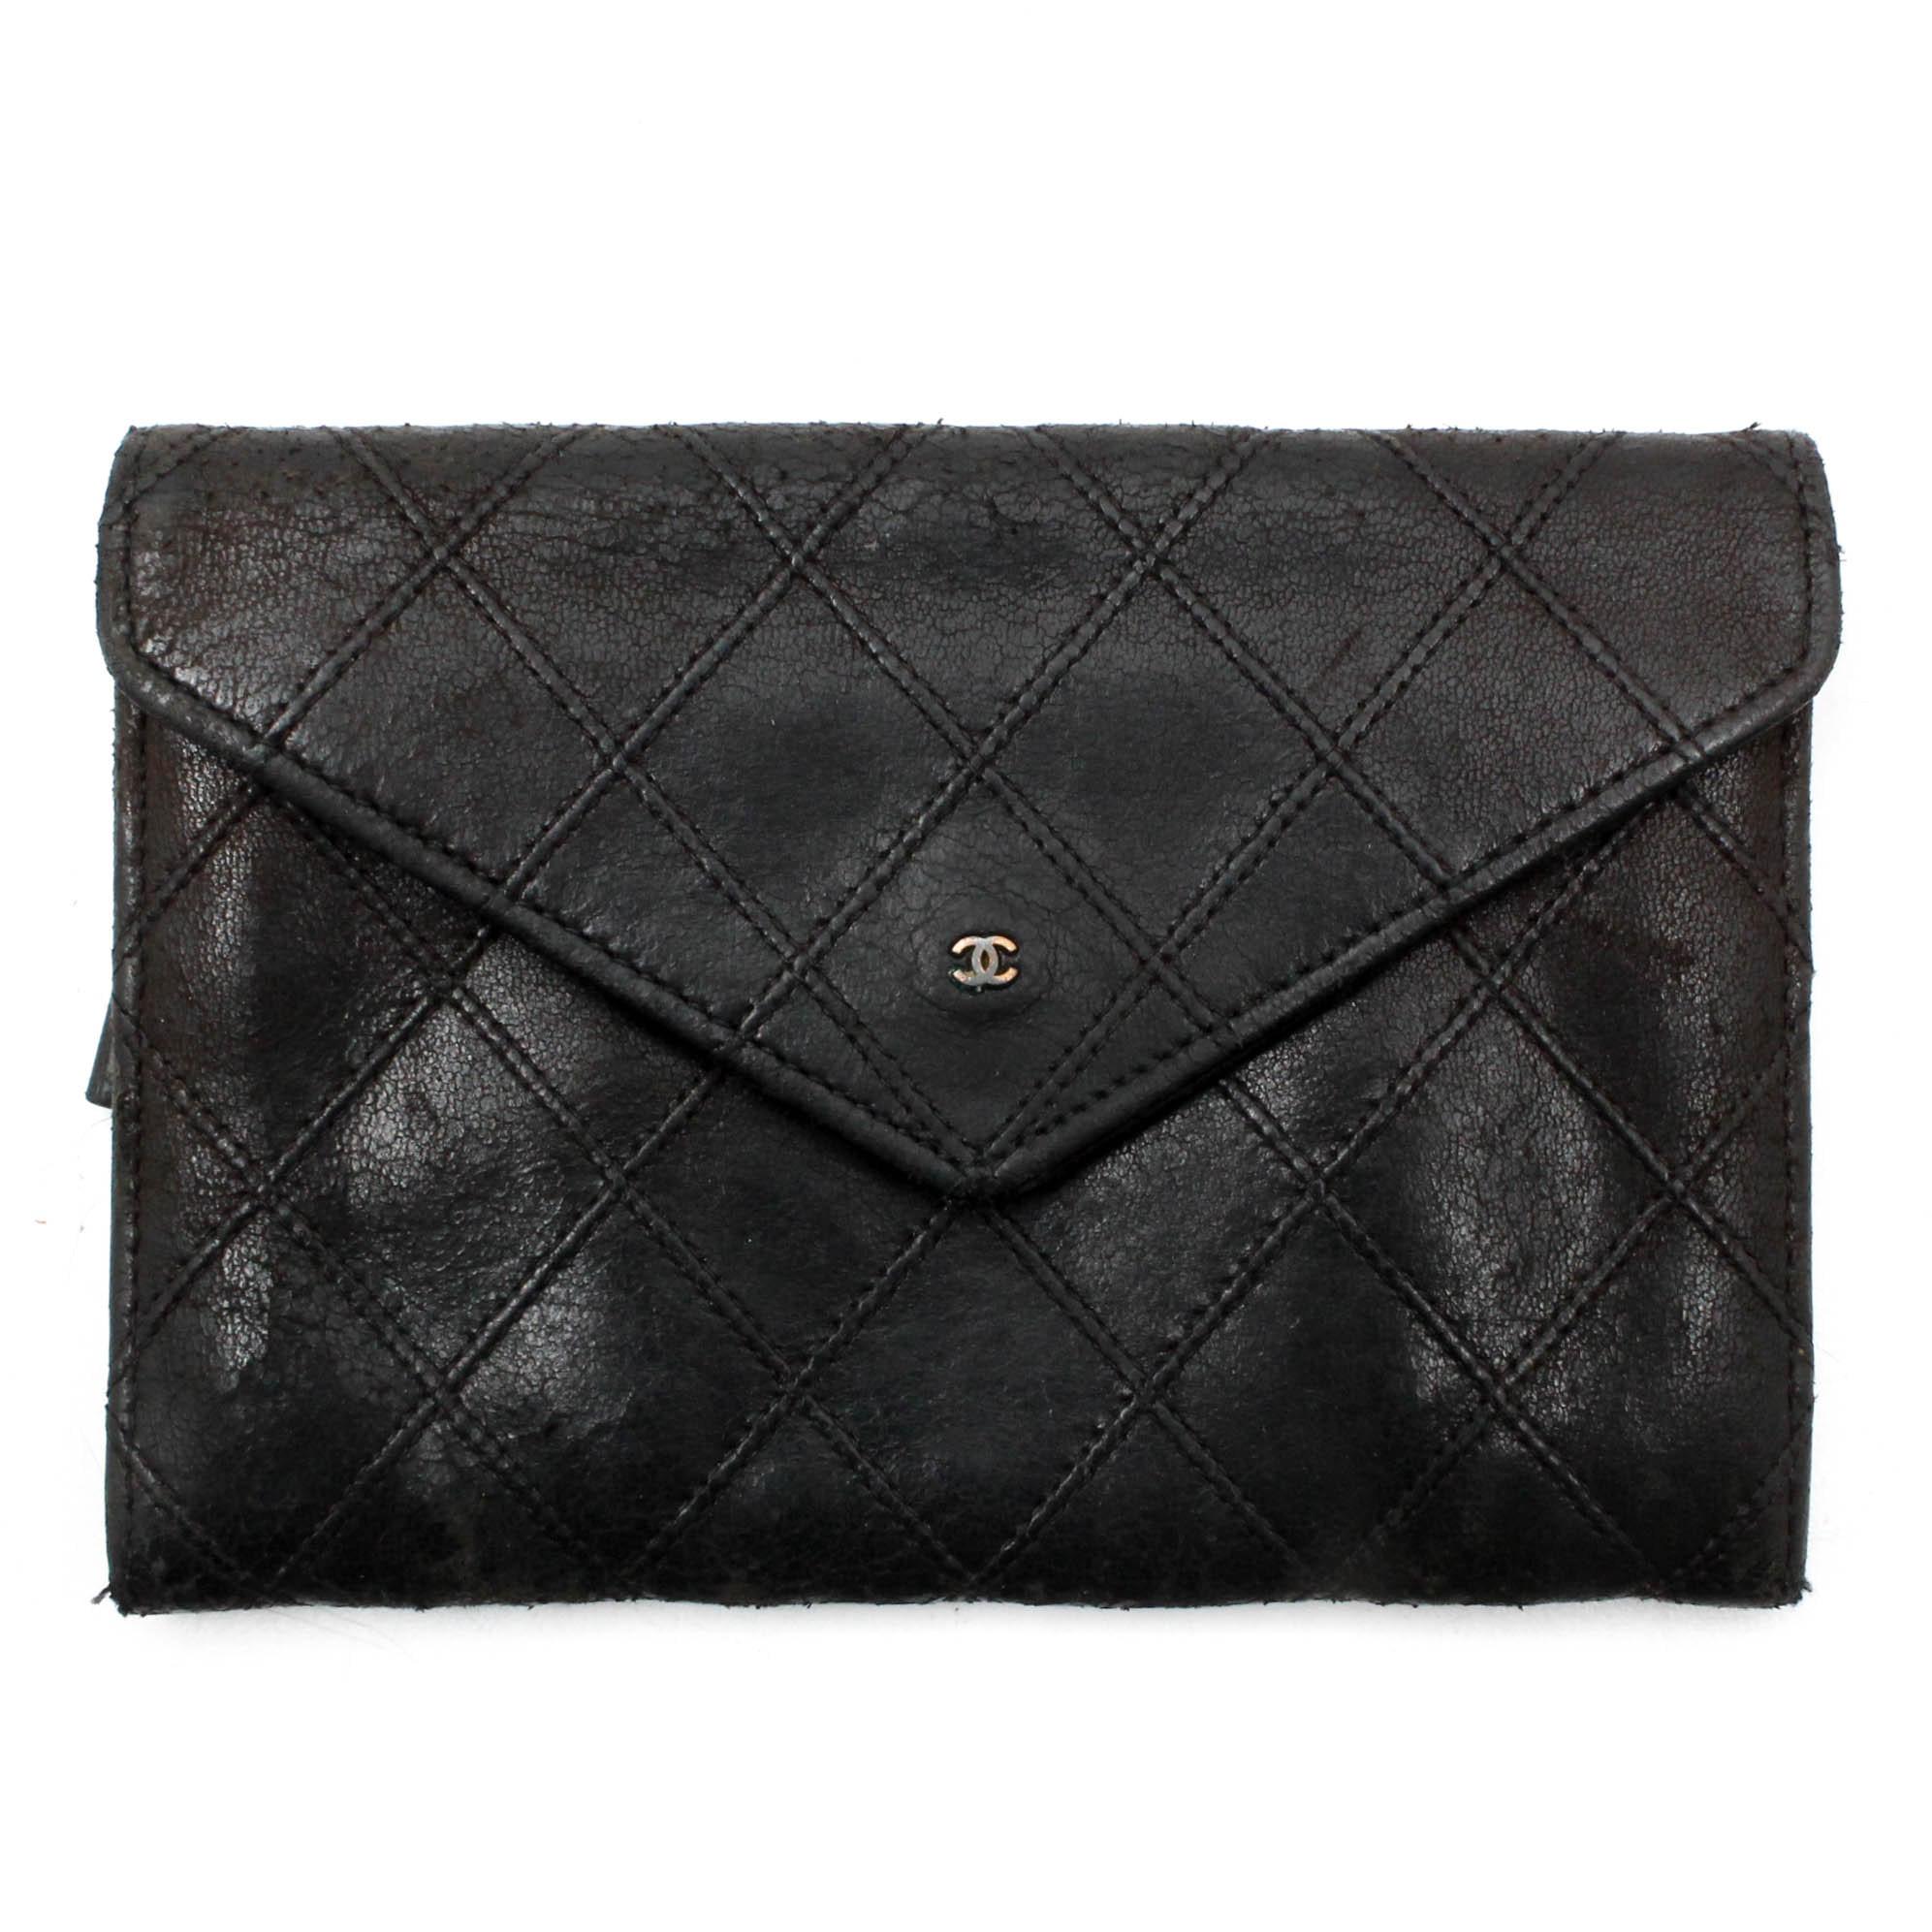 Vintage Chanel Black Quilted Lambskin Leather Envelope Wallet